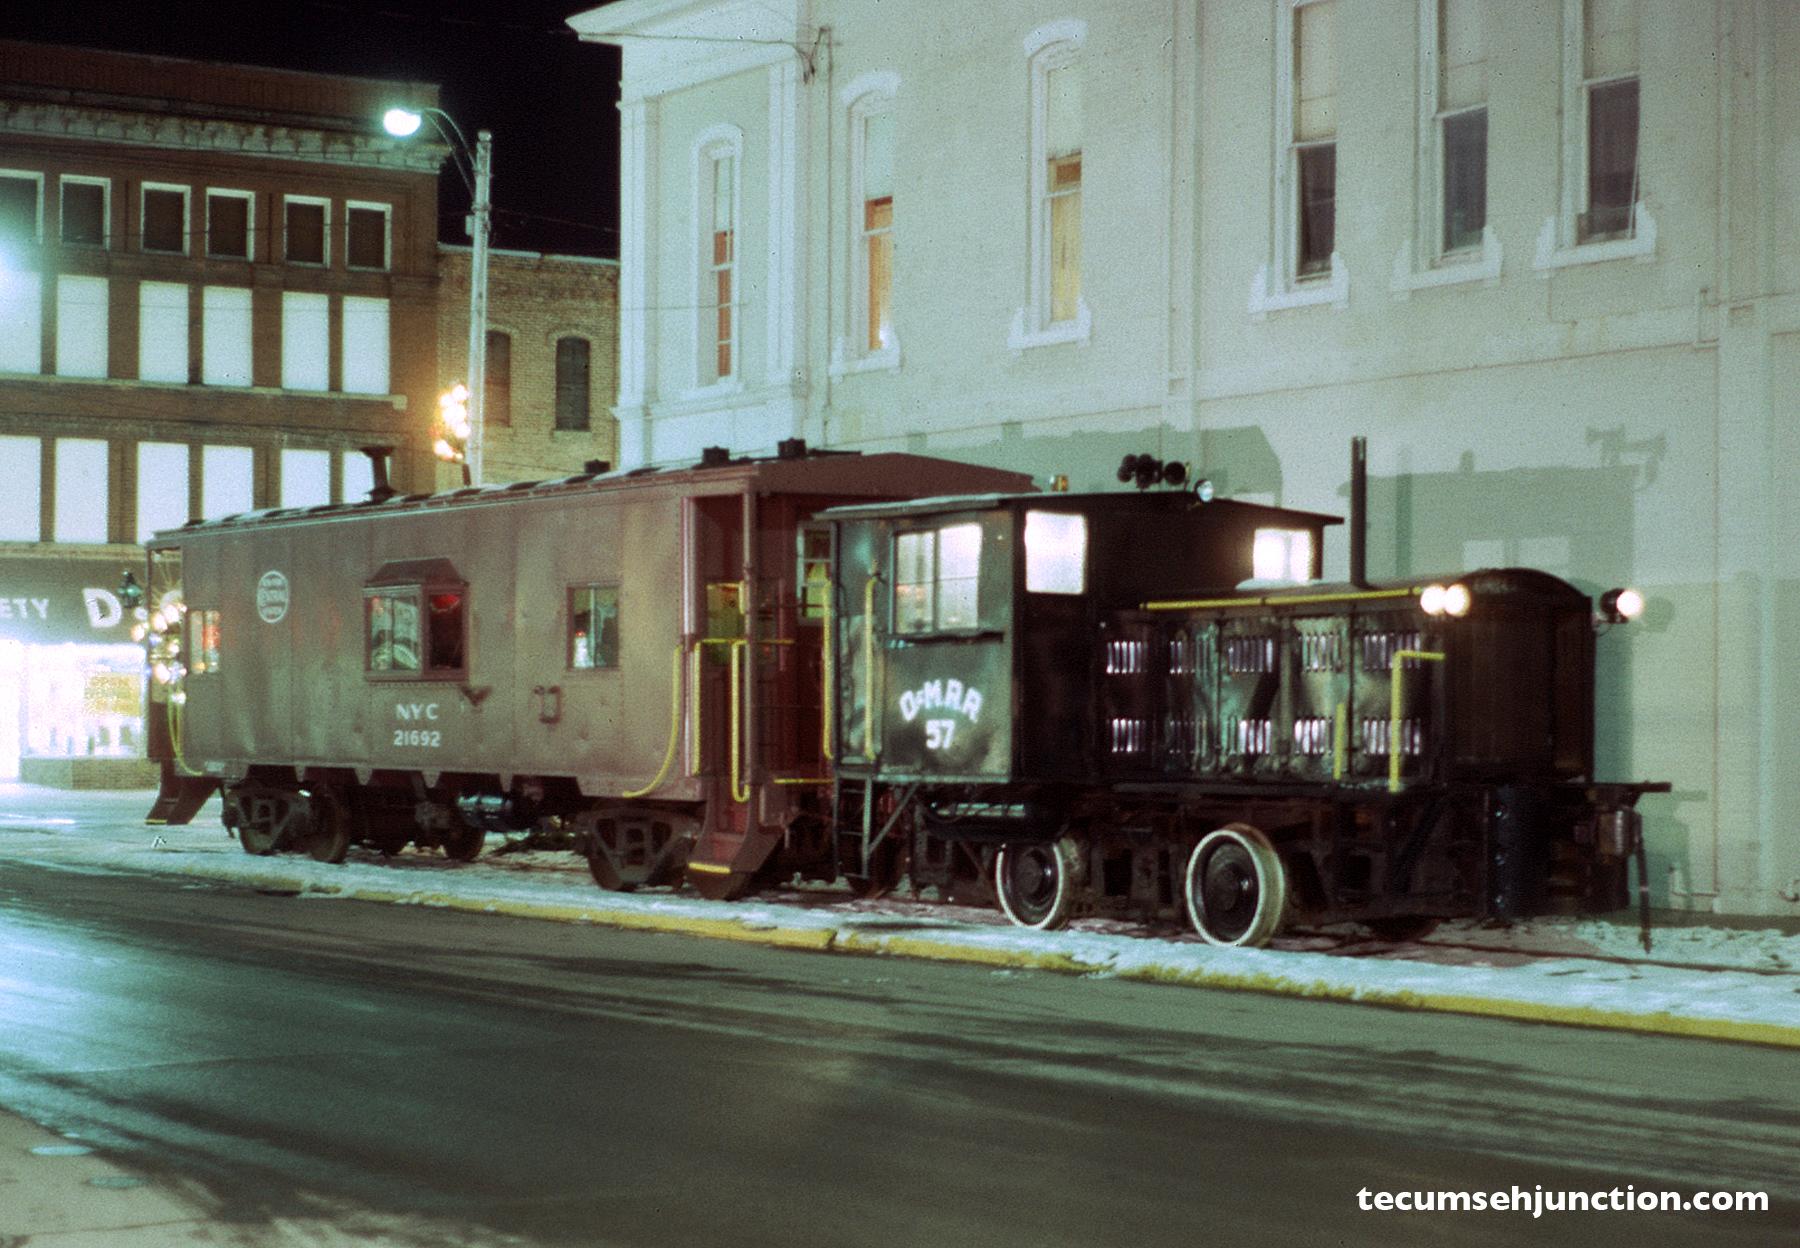 SMRS Christmas train in Tecumseh, Michigan on 05 December 1987